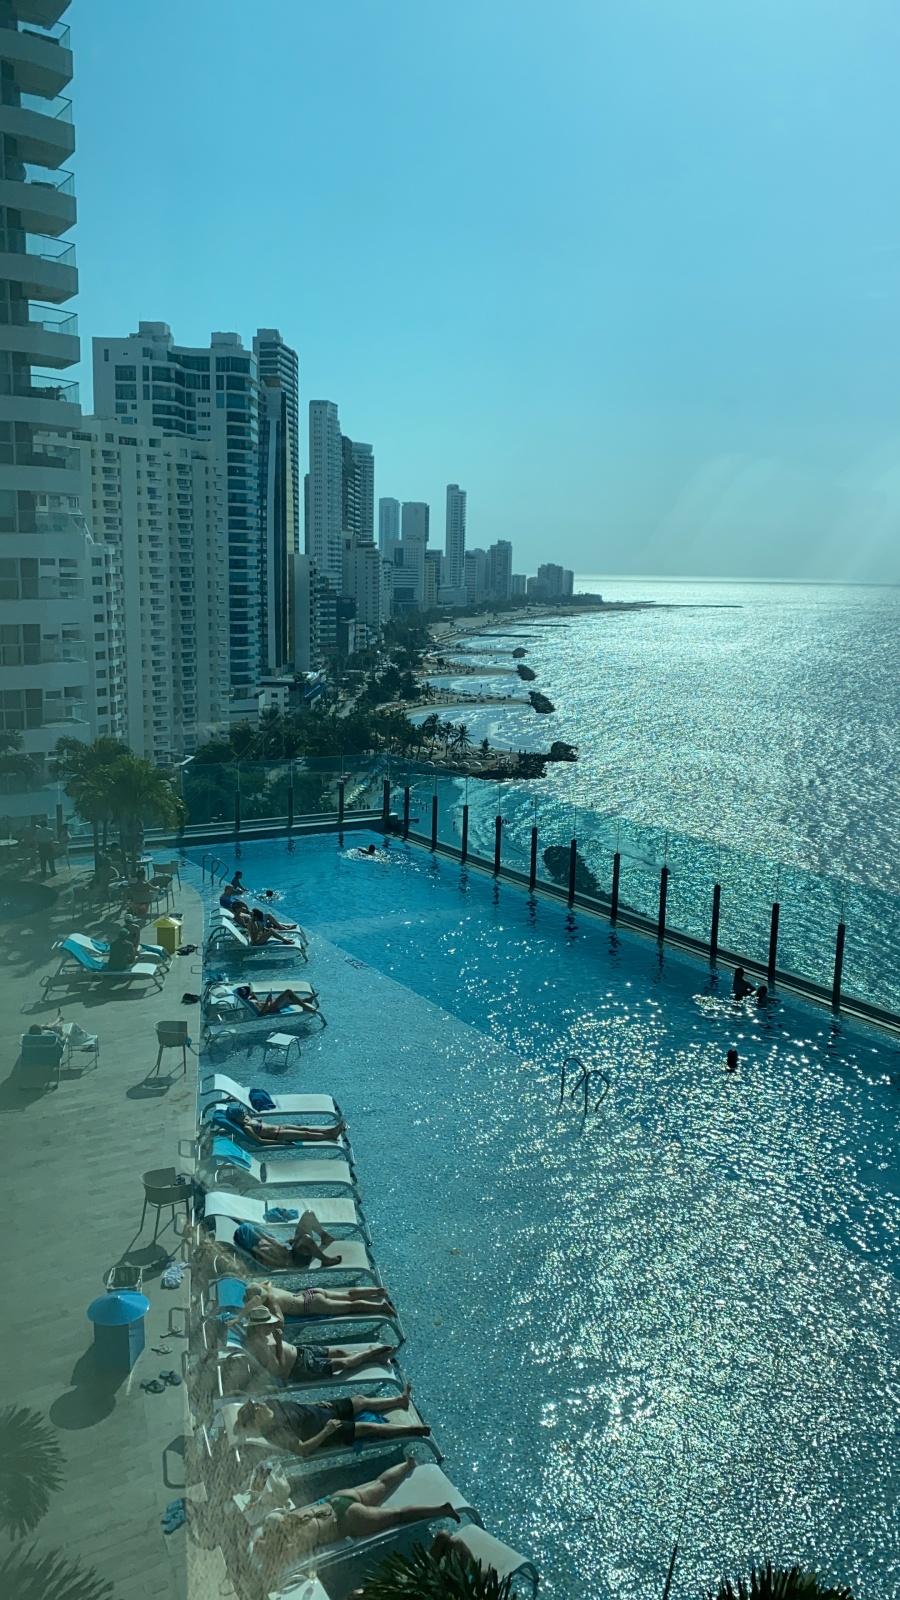 Hotel Estelar Cartagena De Indiasjpg